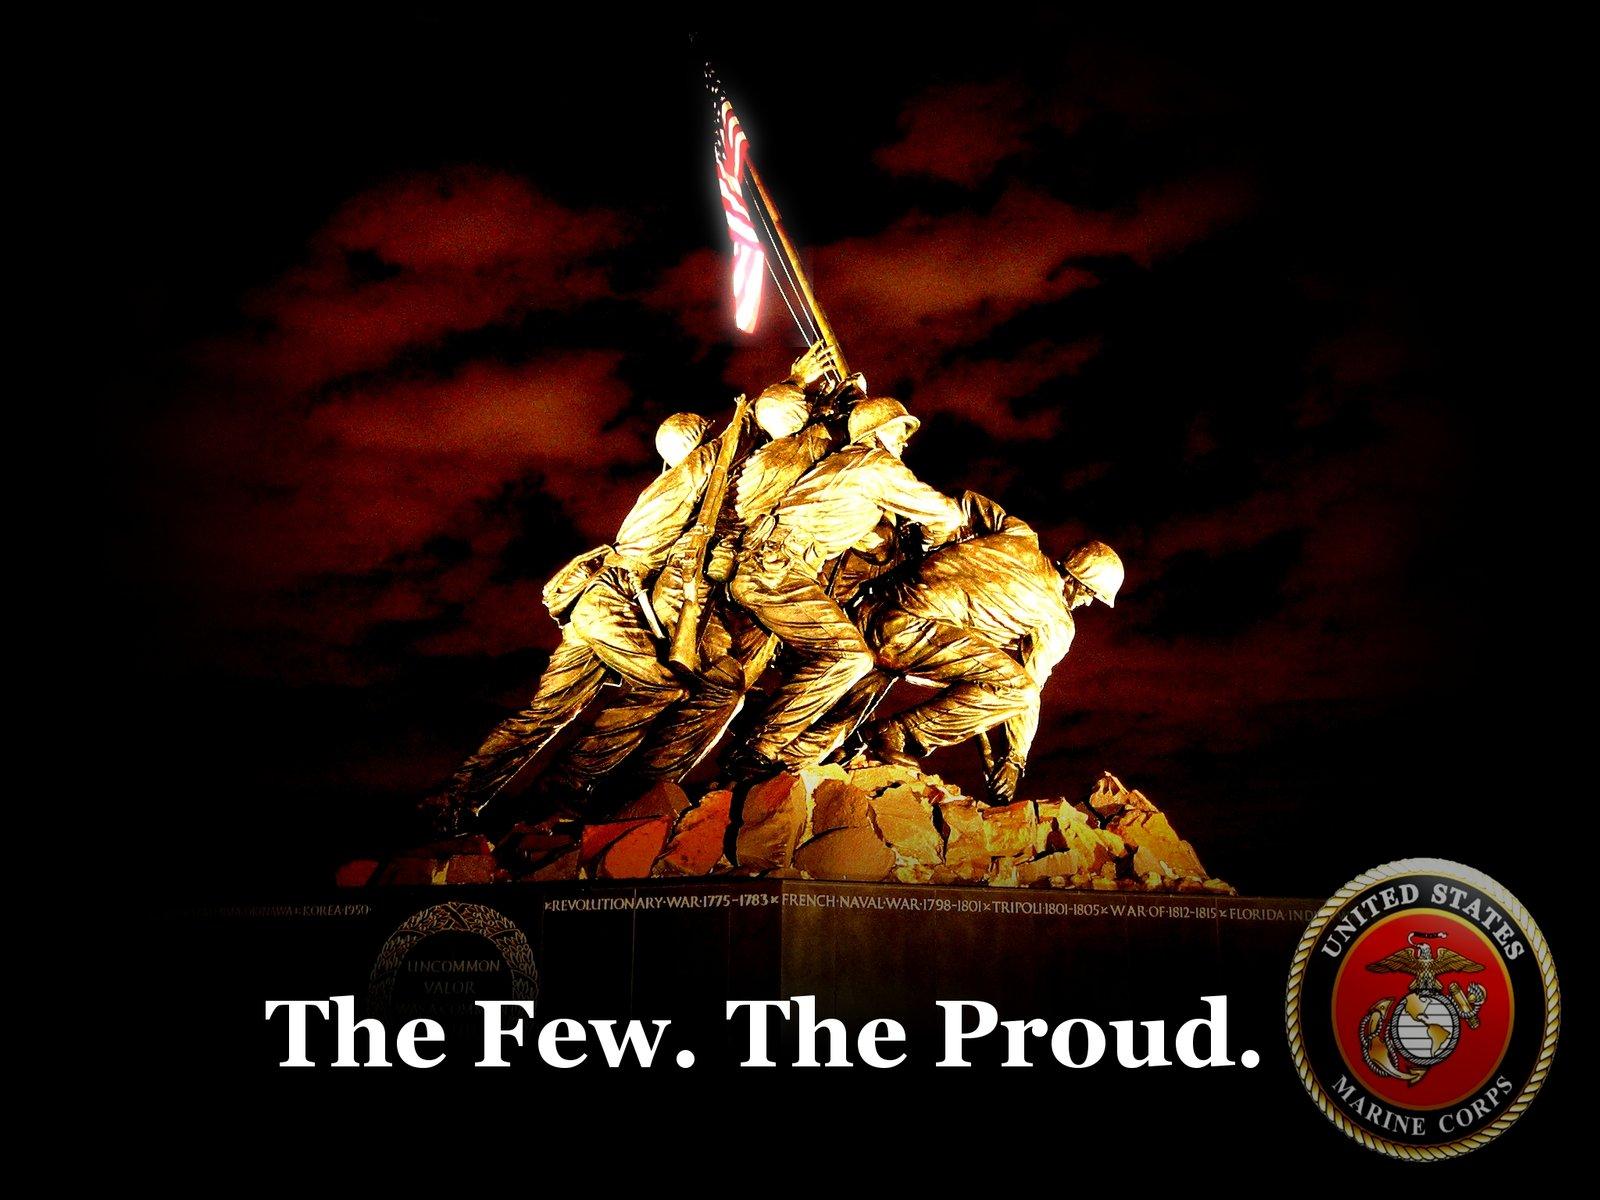 U.S. Marines Wallpaper by uedallas